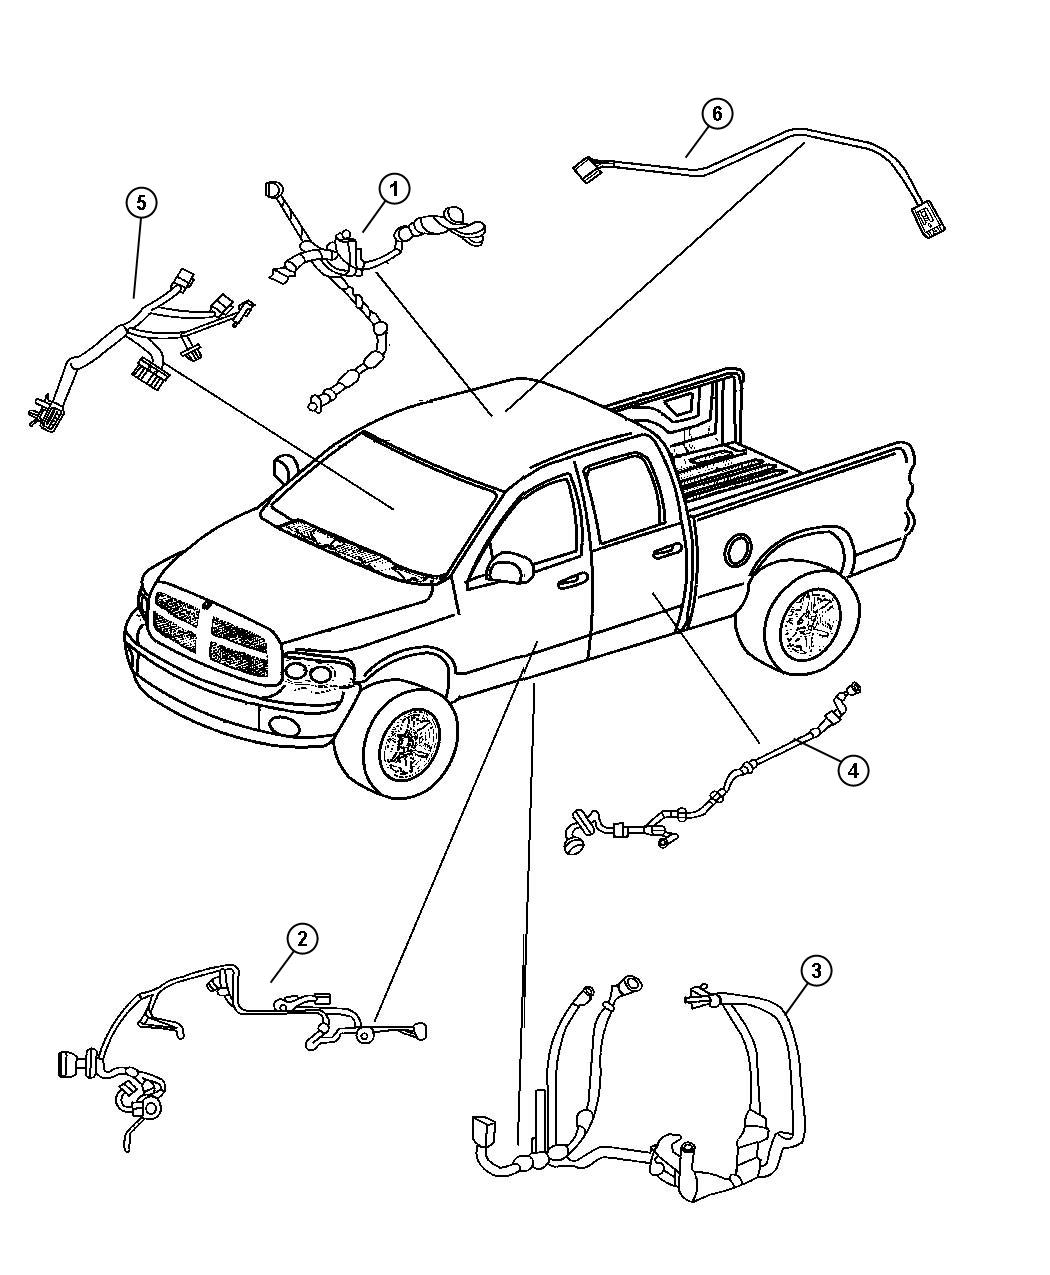 Dodge Dakota Wiring. Body. [4 speakers], [4 speakers